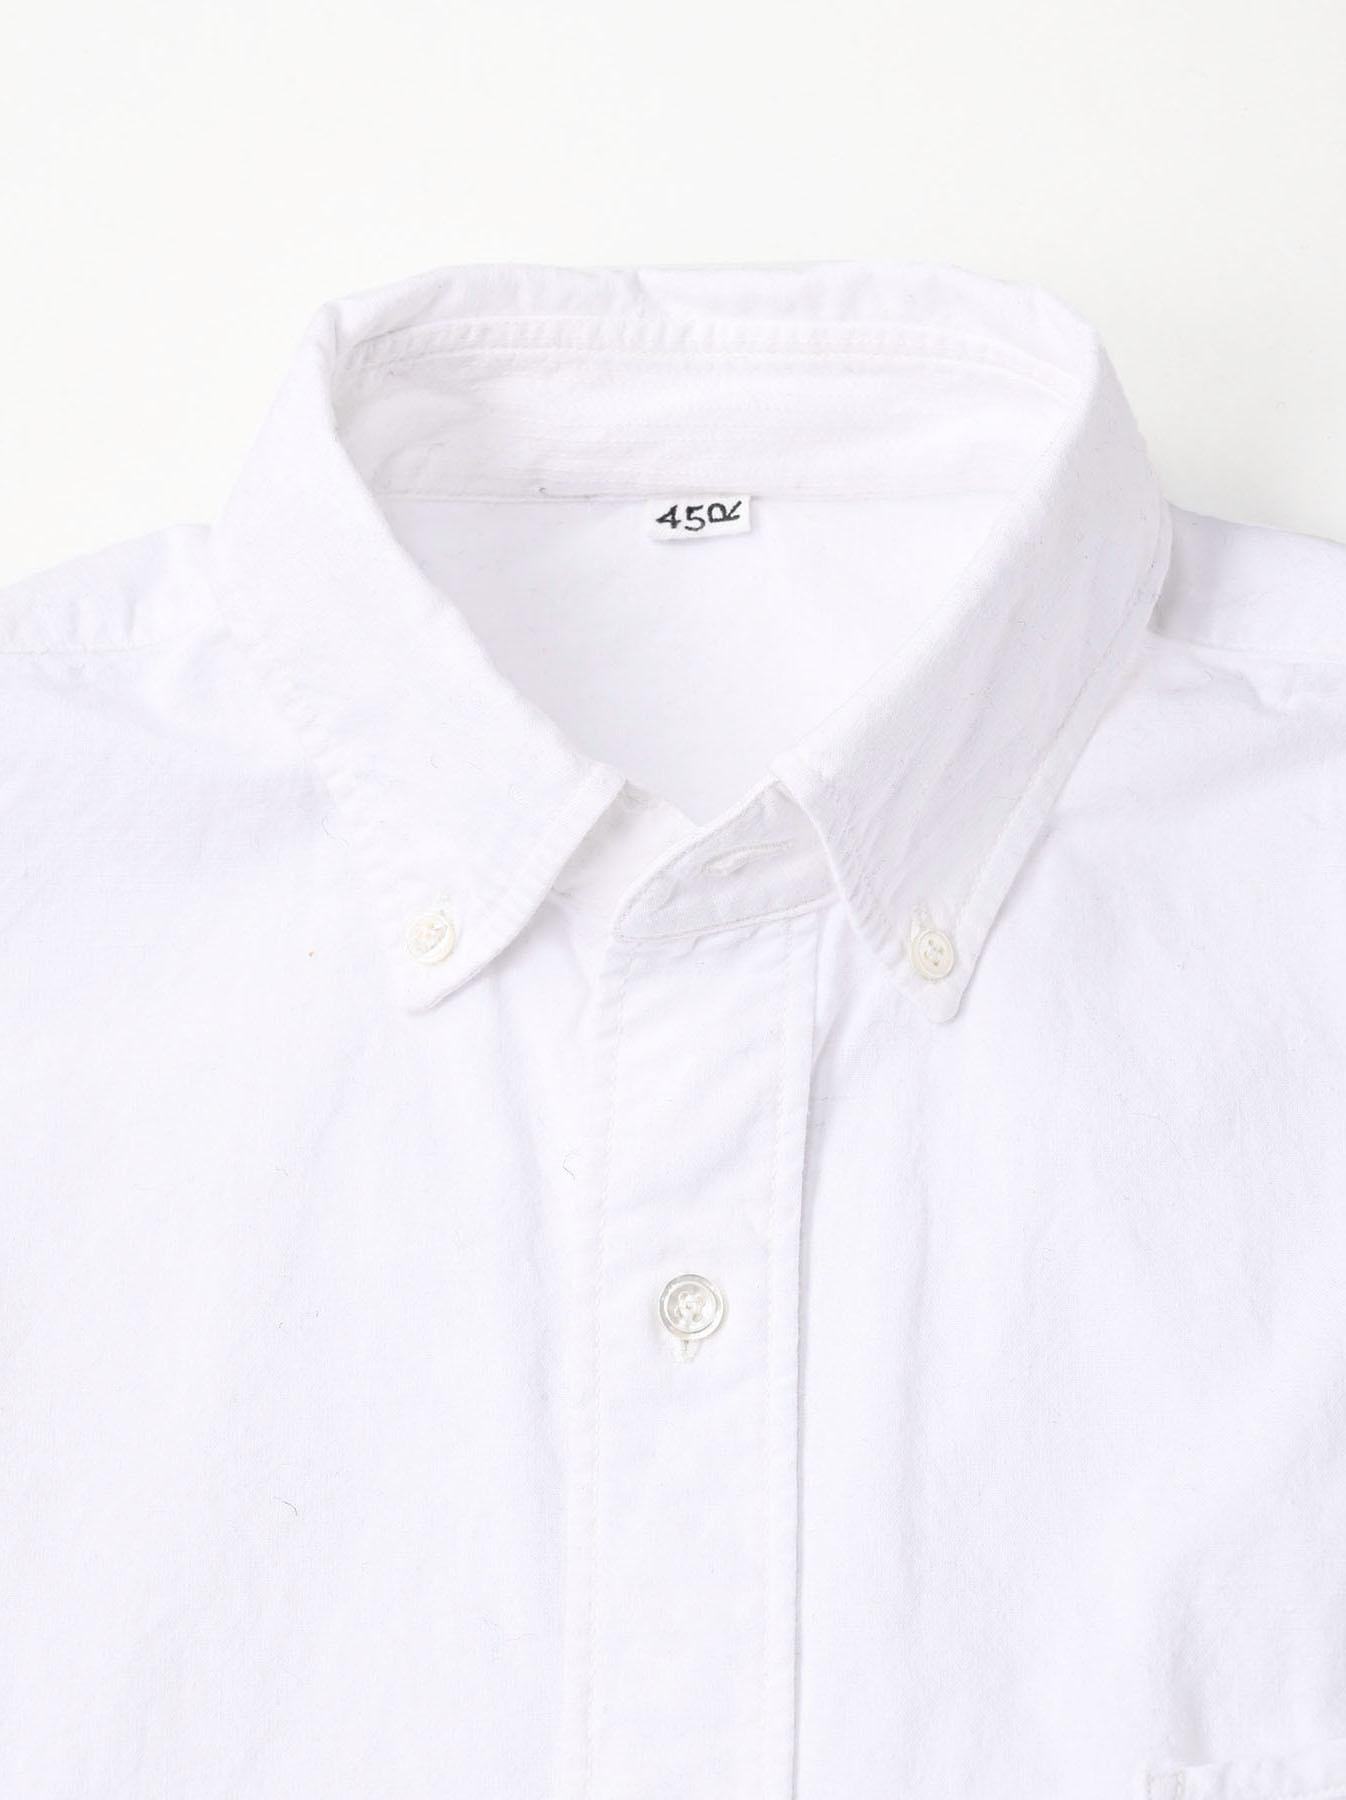 Indian Okome-hira 908 Ocean Button Down Shirt (0321)-10